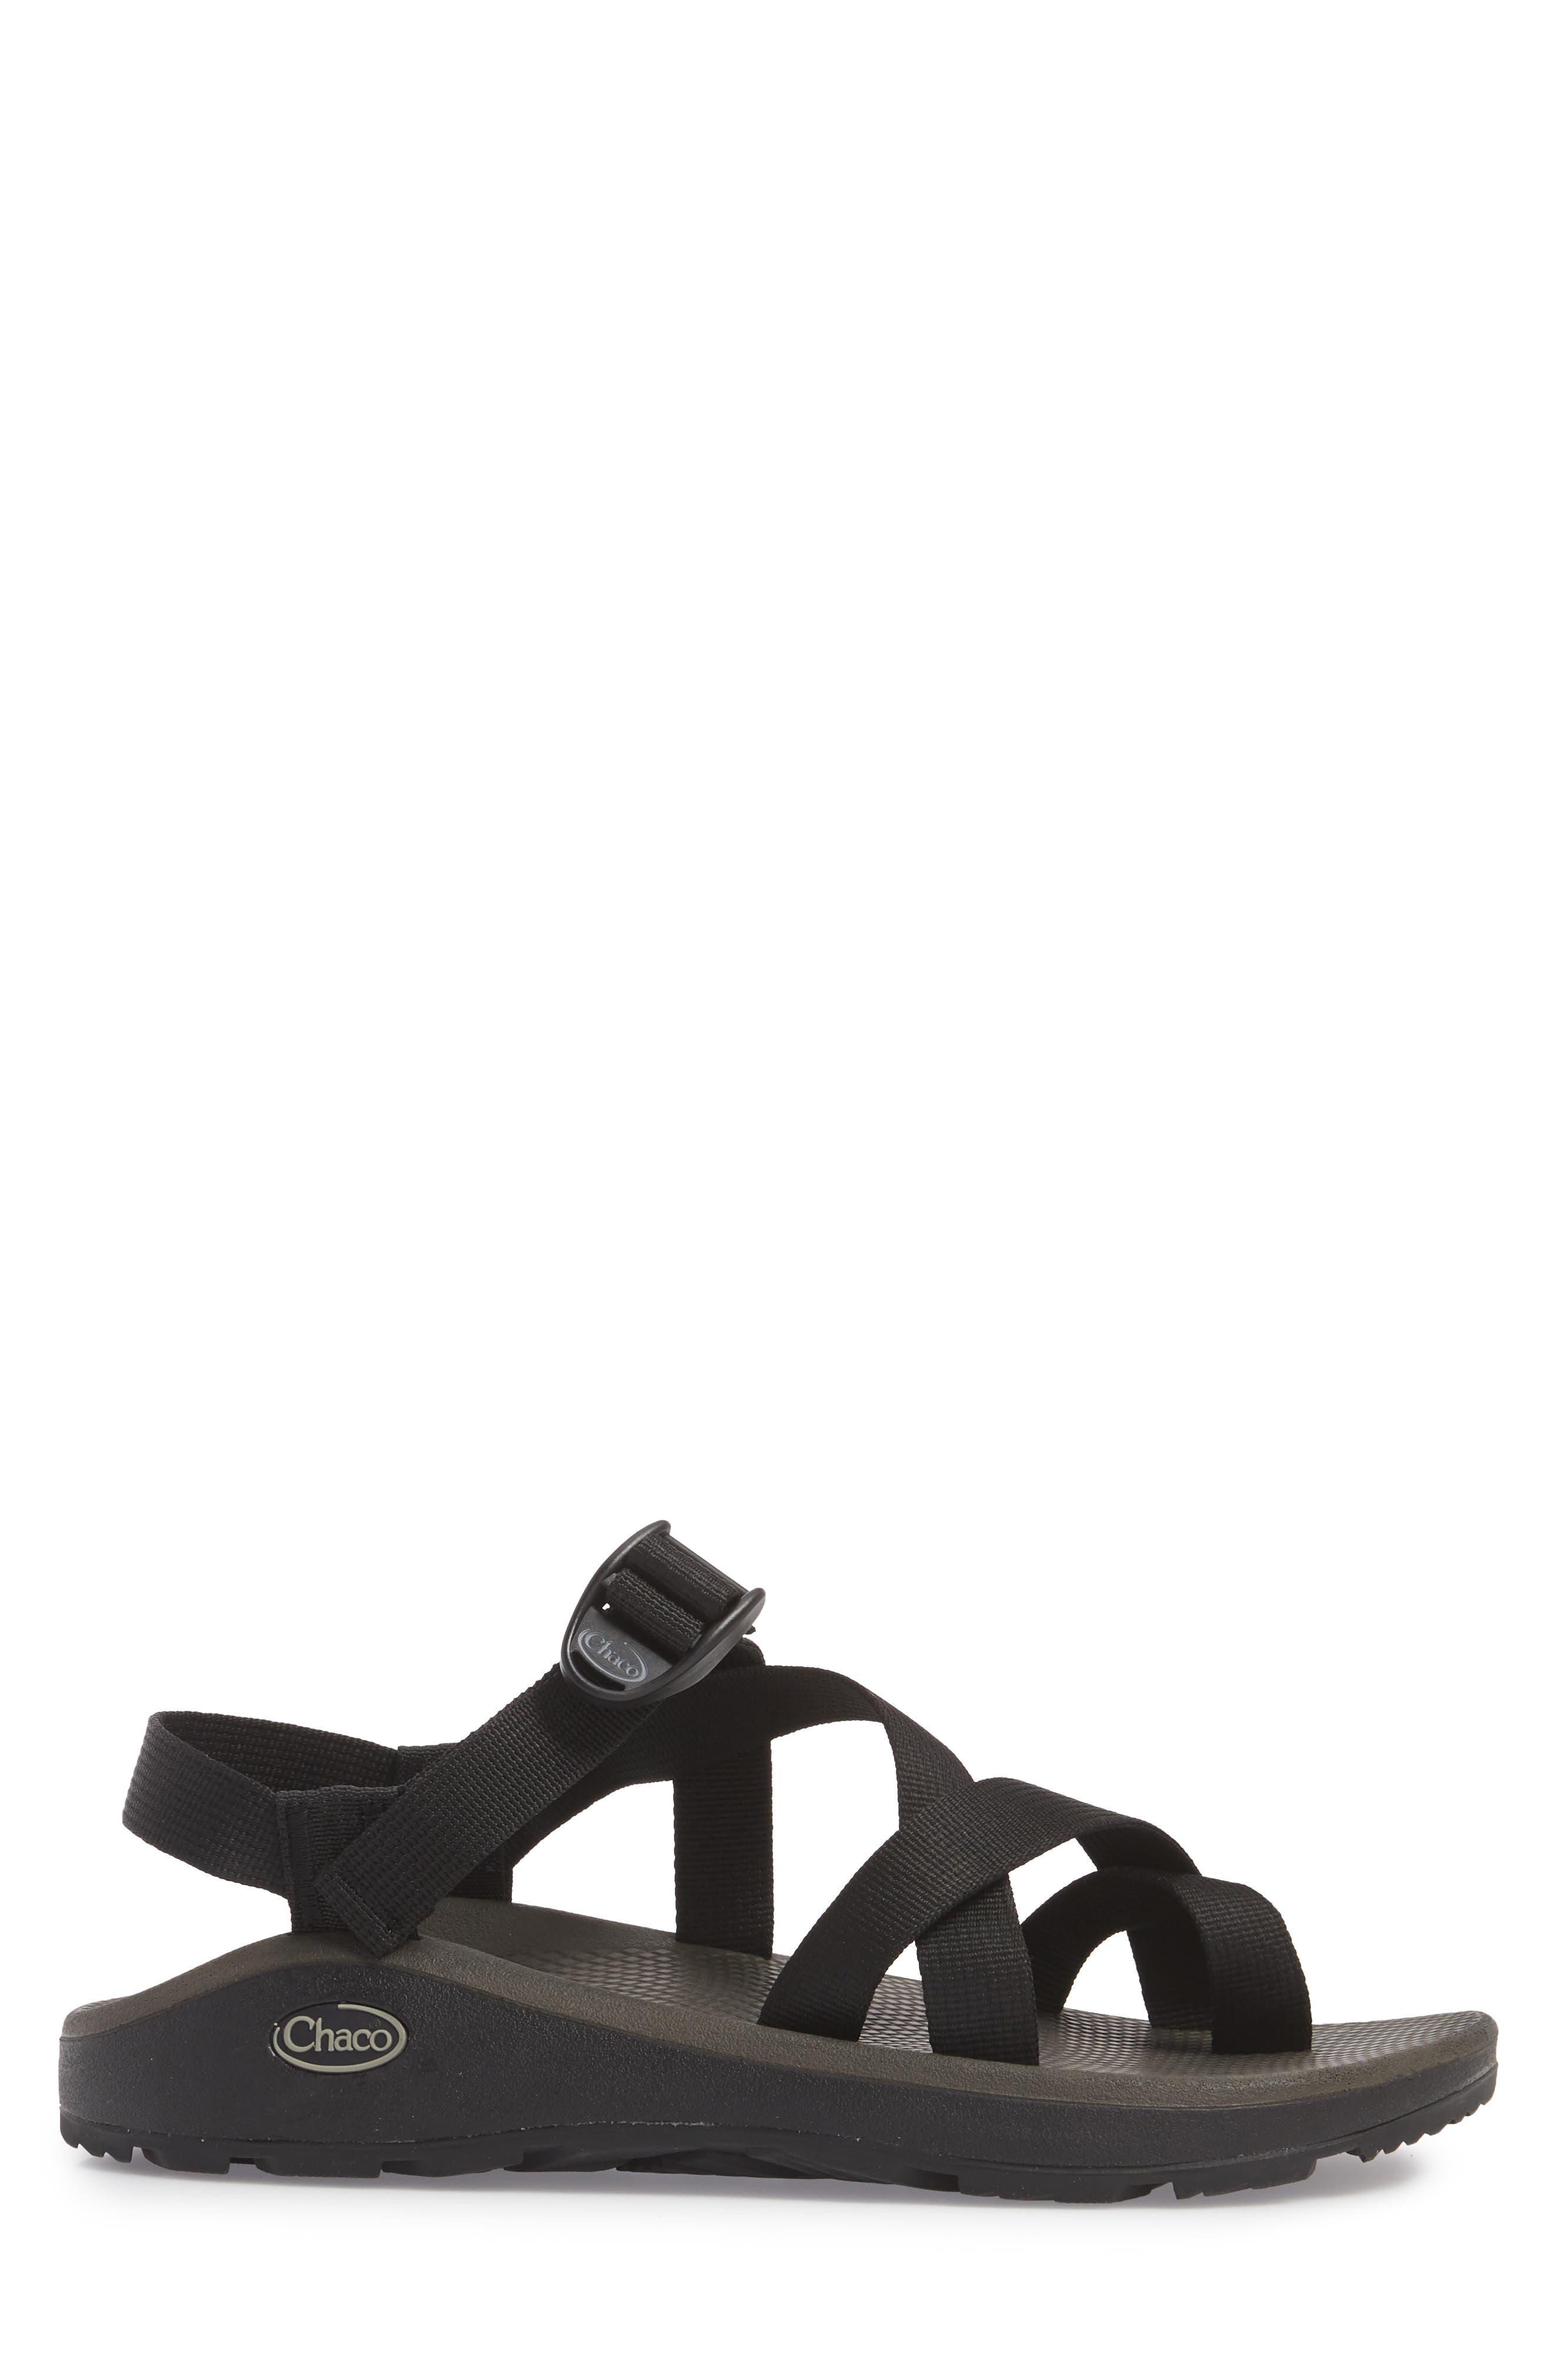 Z/Cloud 2 Sport Sandal,                             Alternate thumbnail 3, color,                             Black